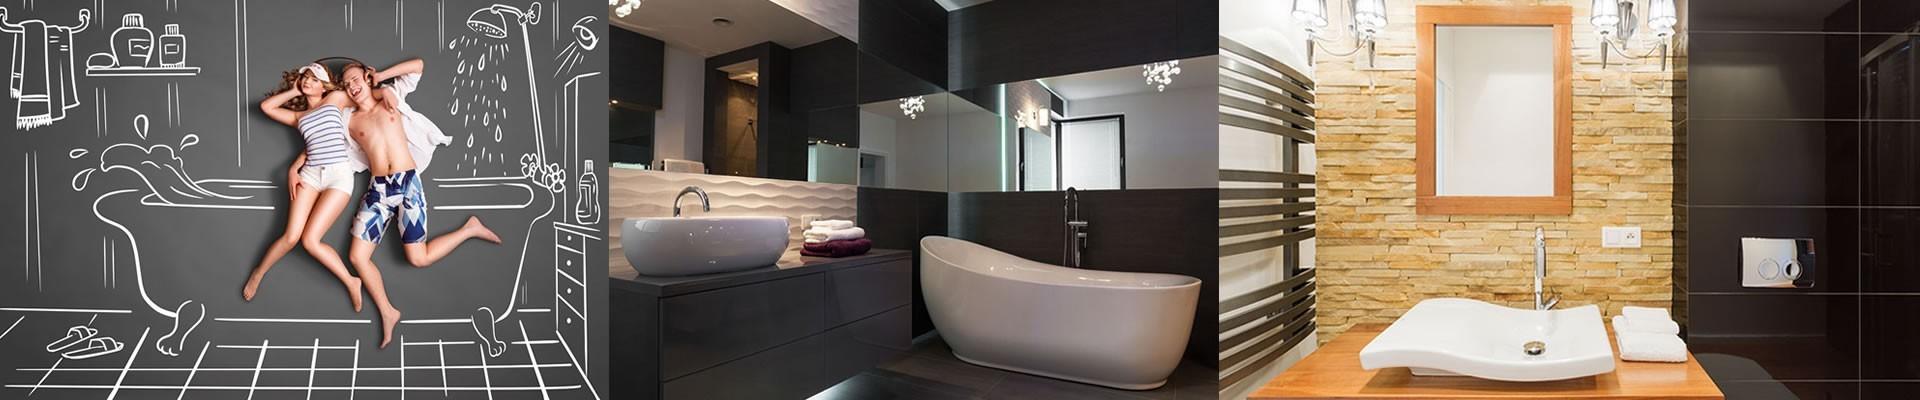 Bathroom | Cabinets, Mirrors, Lighting & Other Bathroom Ideas